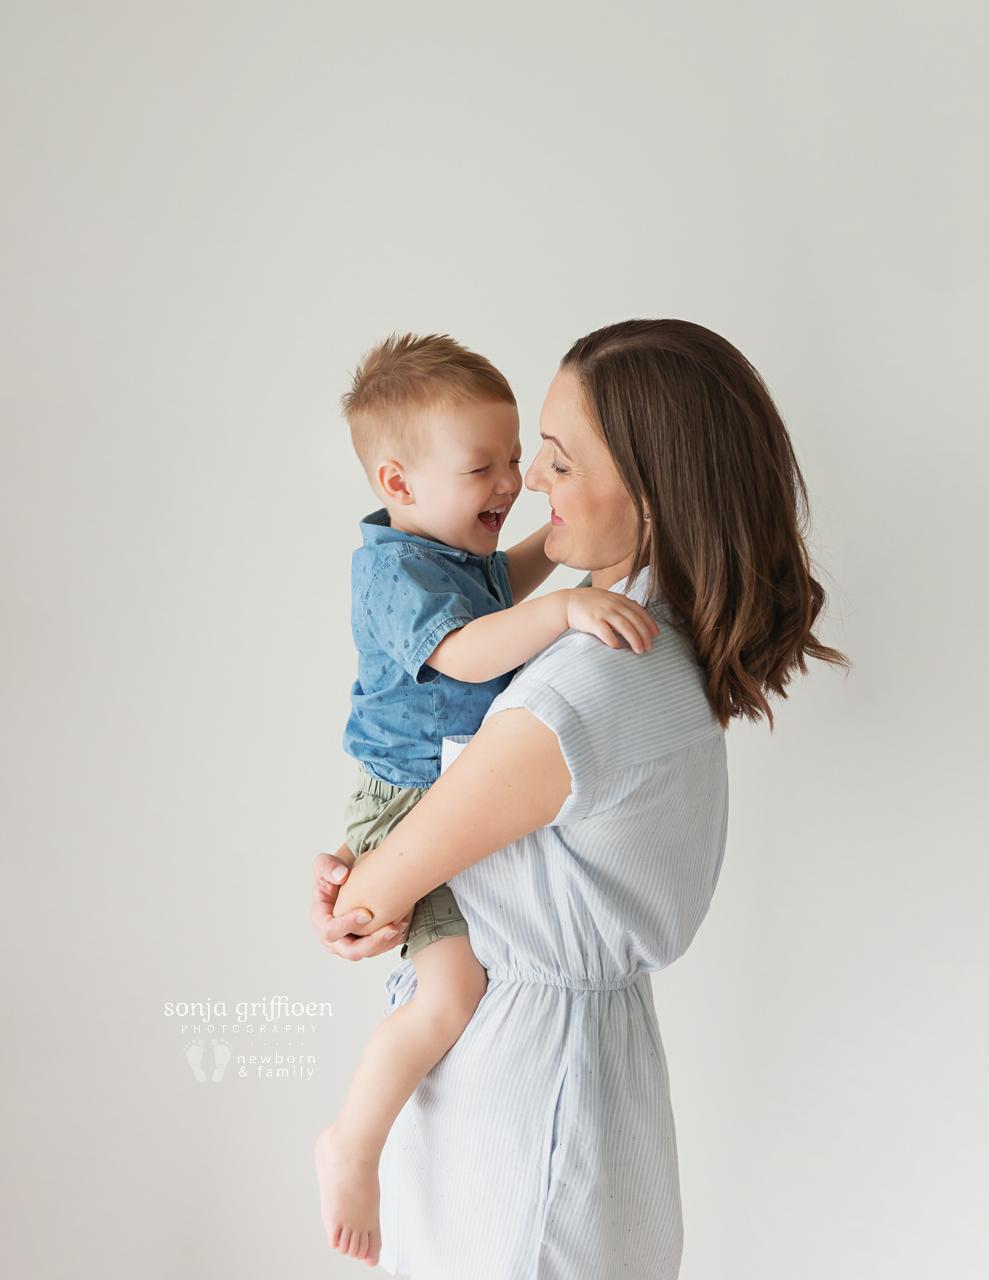 Caleigh-Newborn-Brisbane-Newborn-Photographer-Sonja-Griffioen-13.jpg